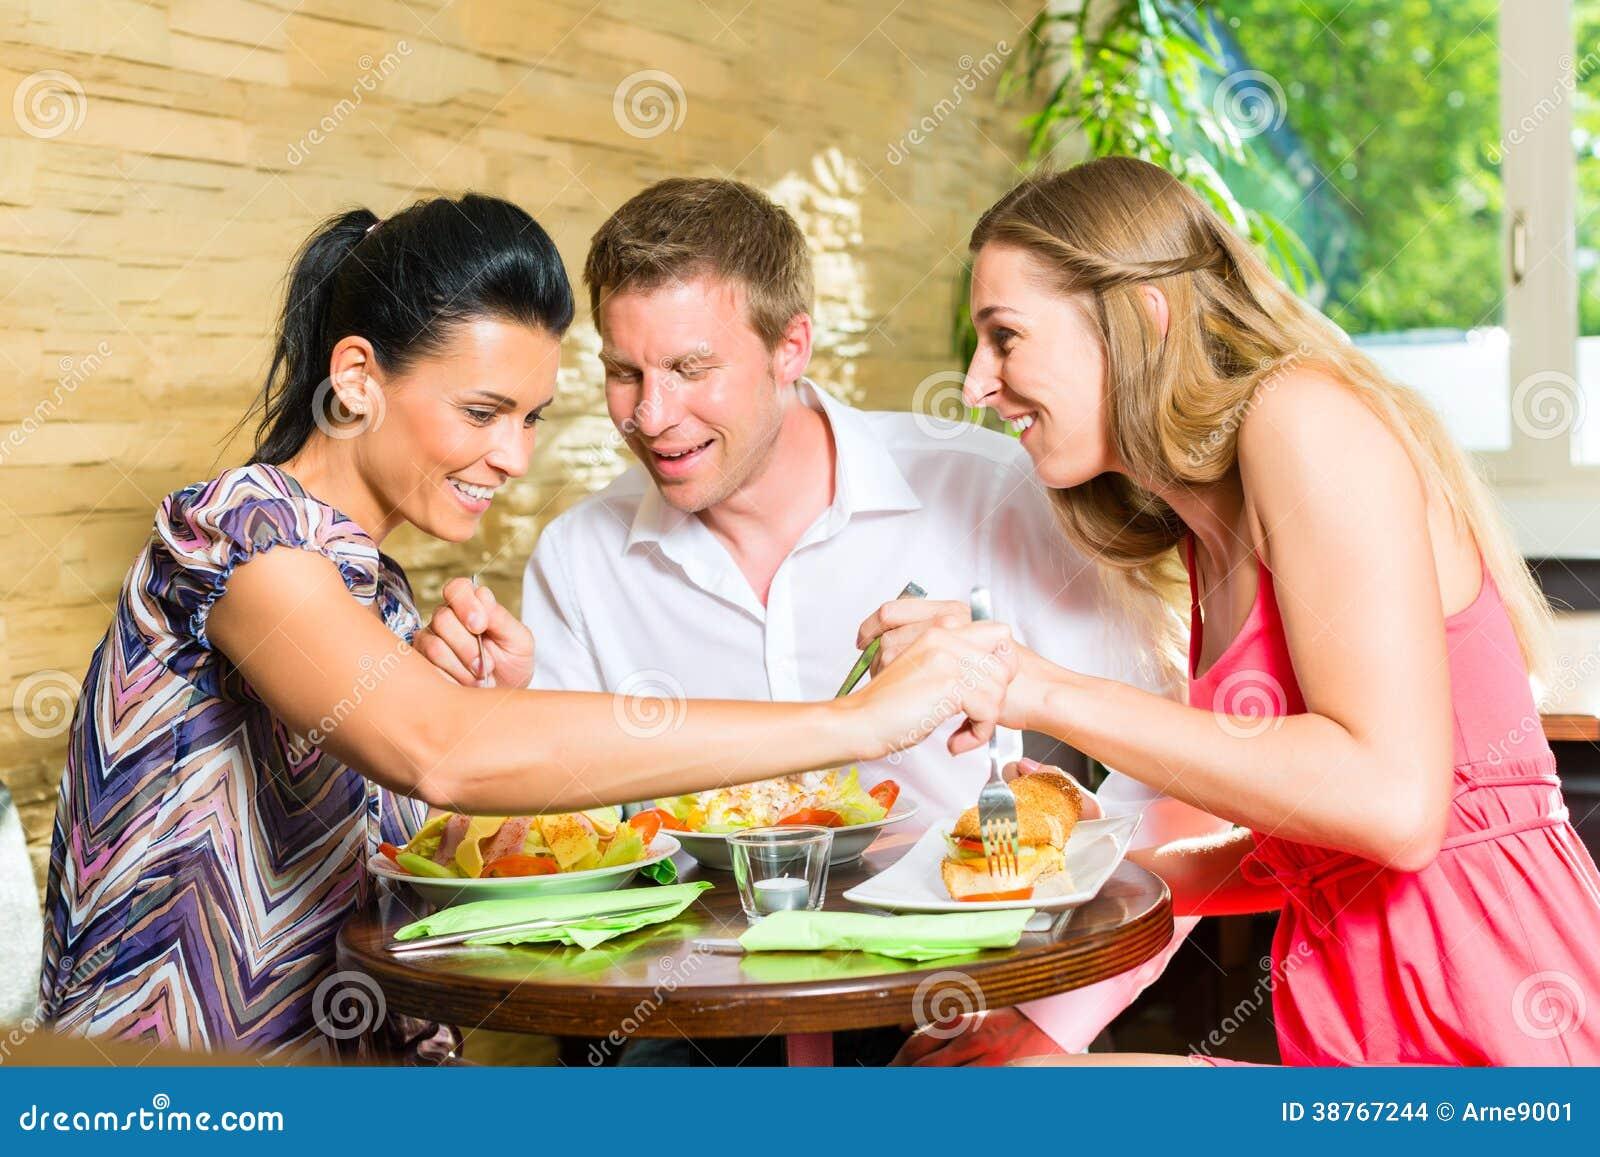 Dating salade dating sites bladeren